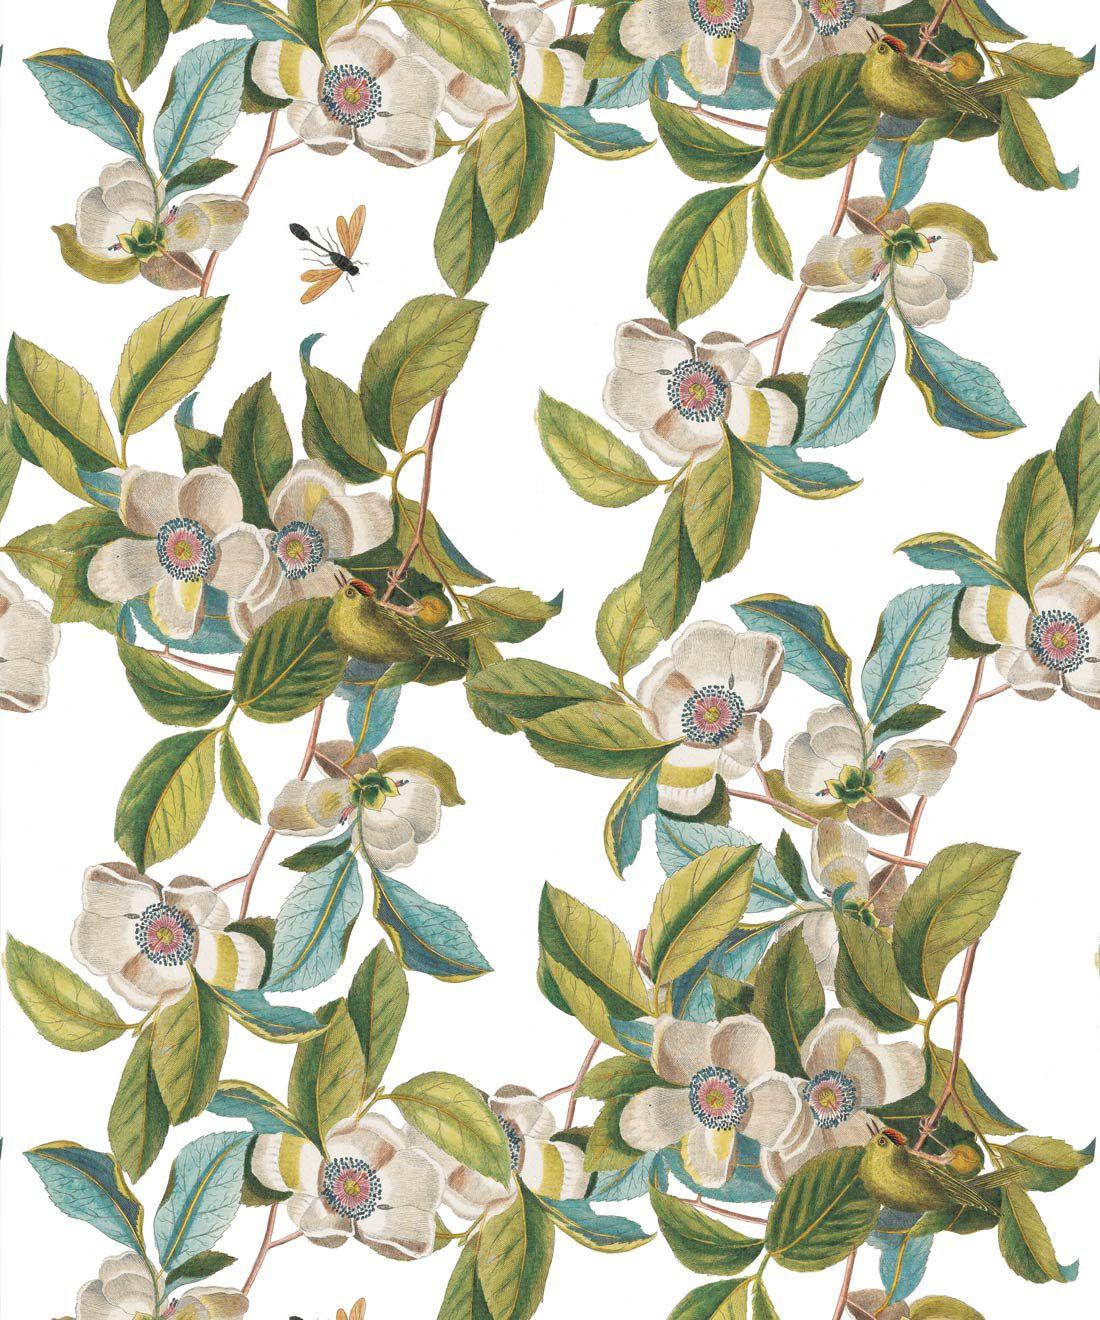 Midsummer Garden Wallpaper